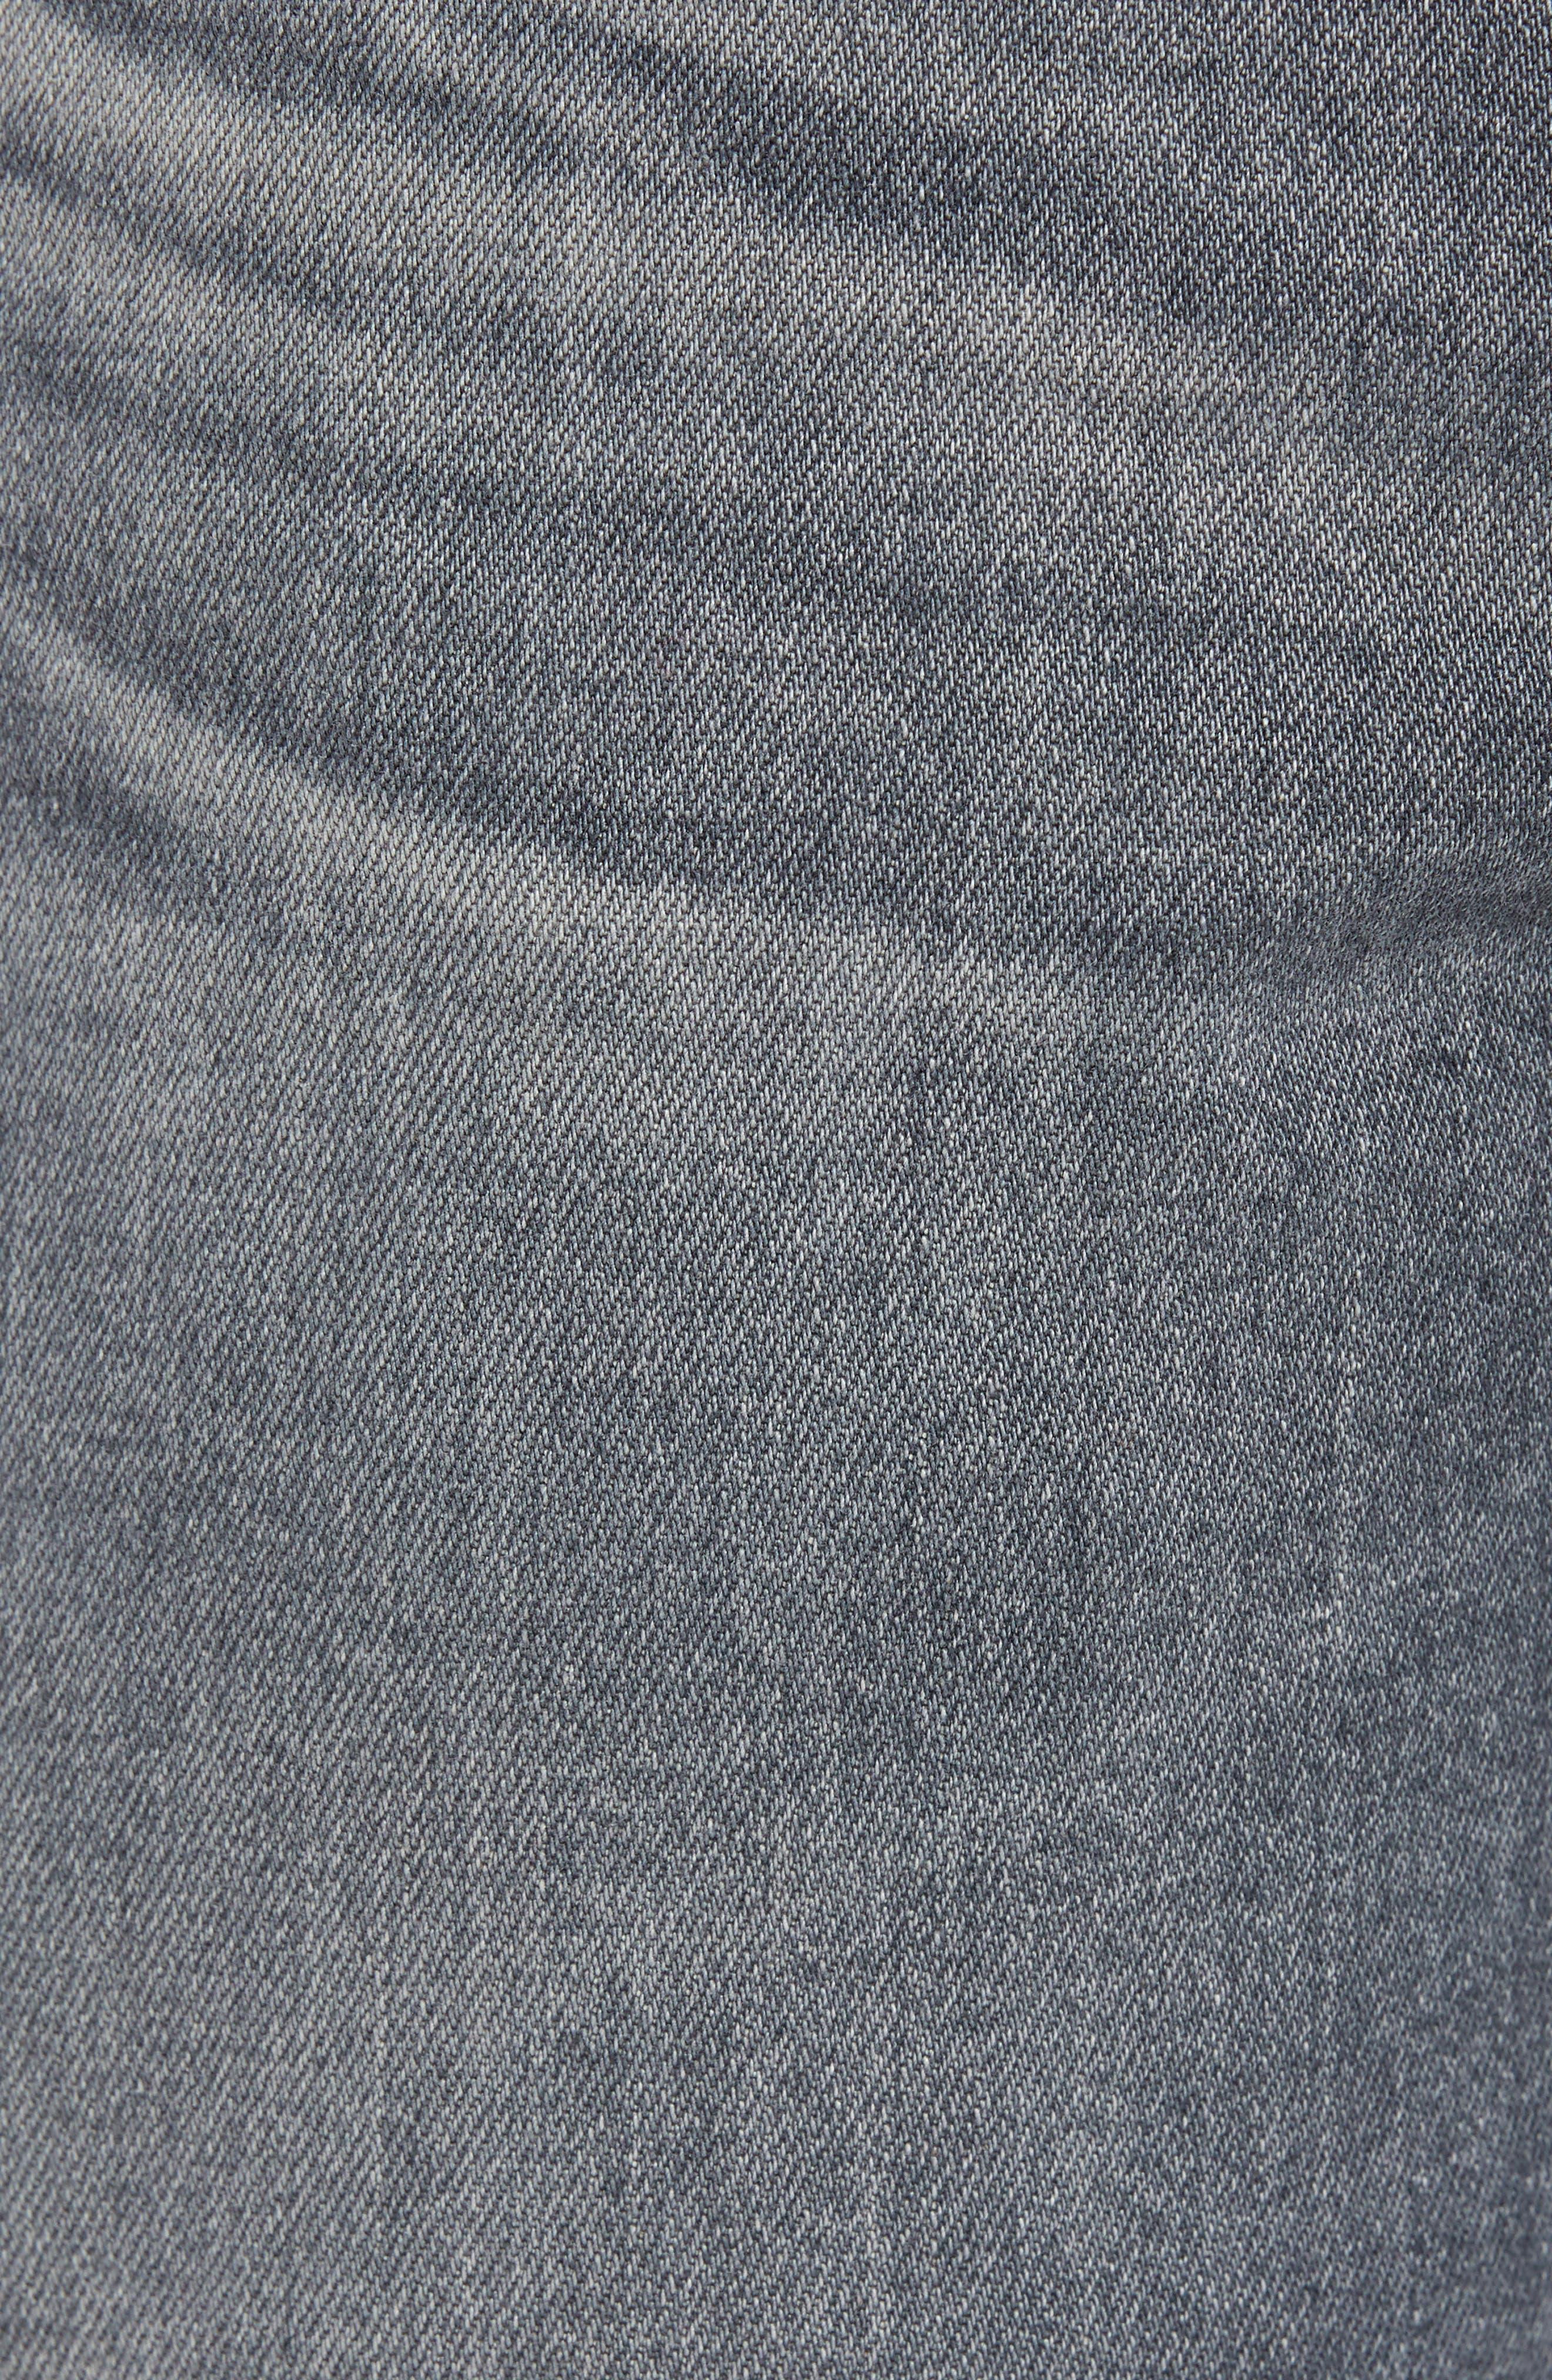 Tellis Slim Fit Jeans,                             Alternate thumbnail 5, color,                             8 YEARS CONJURE